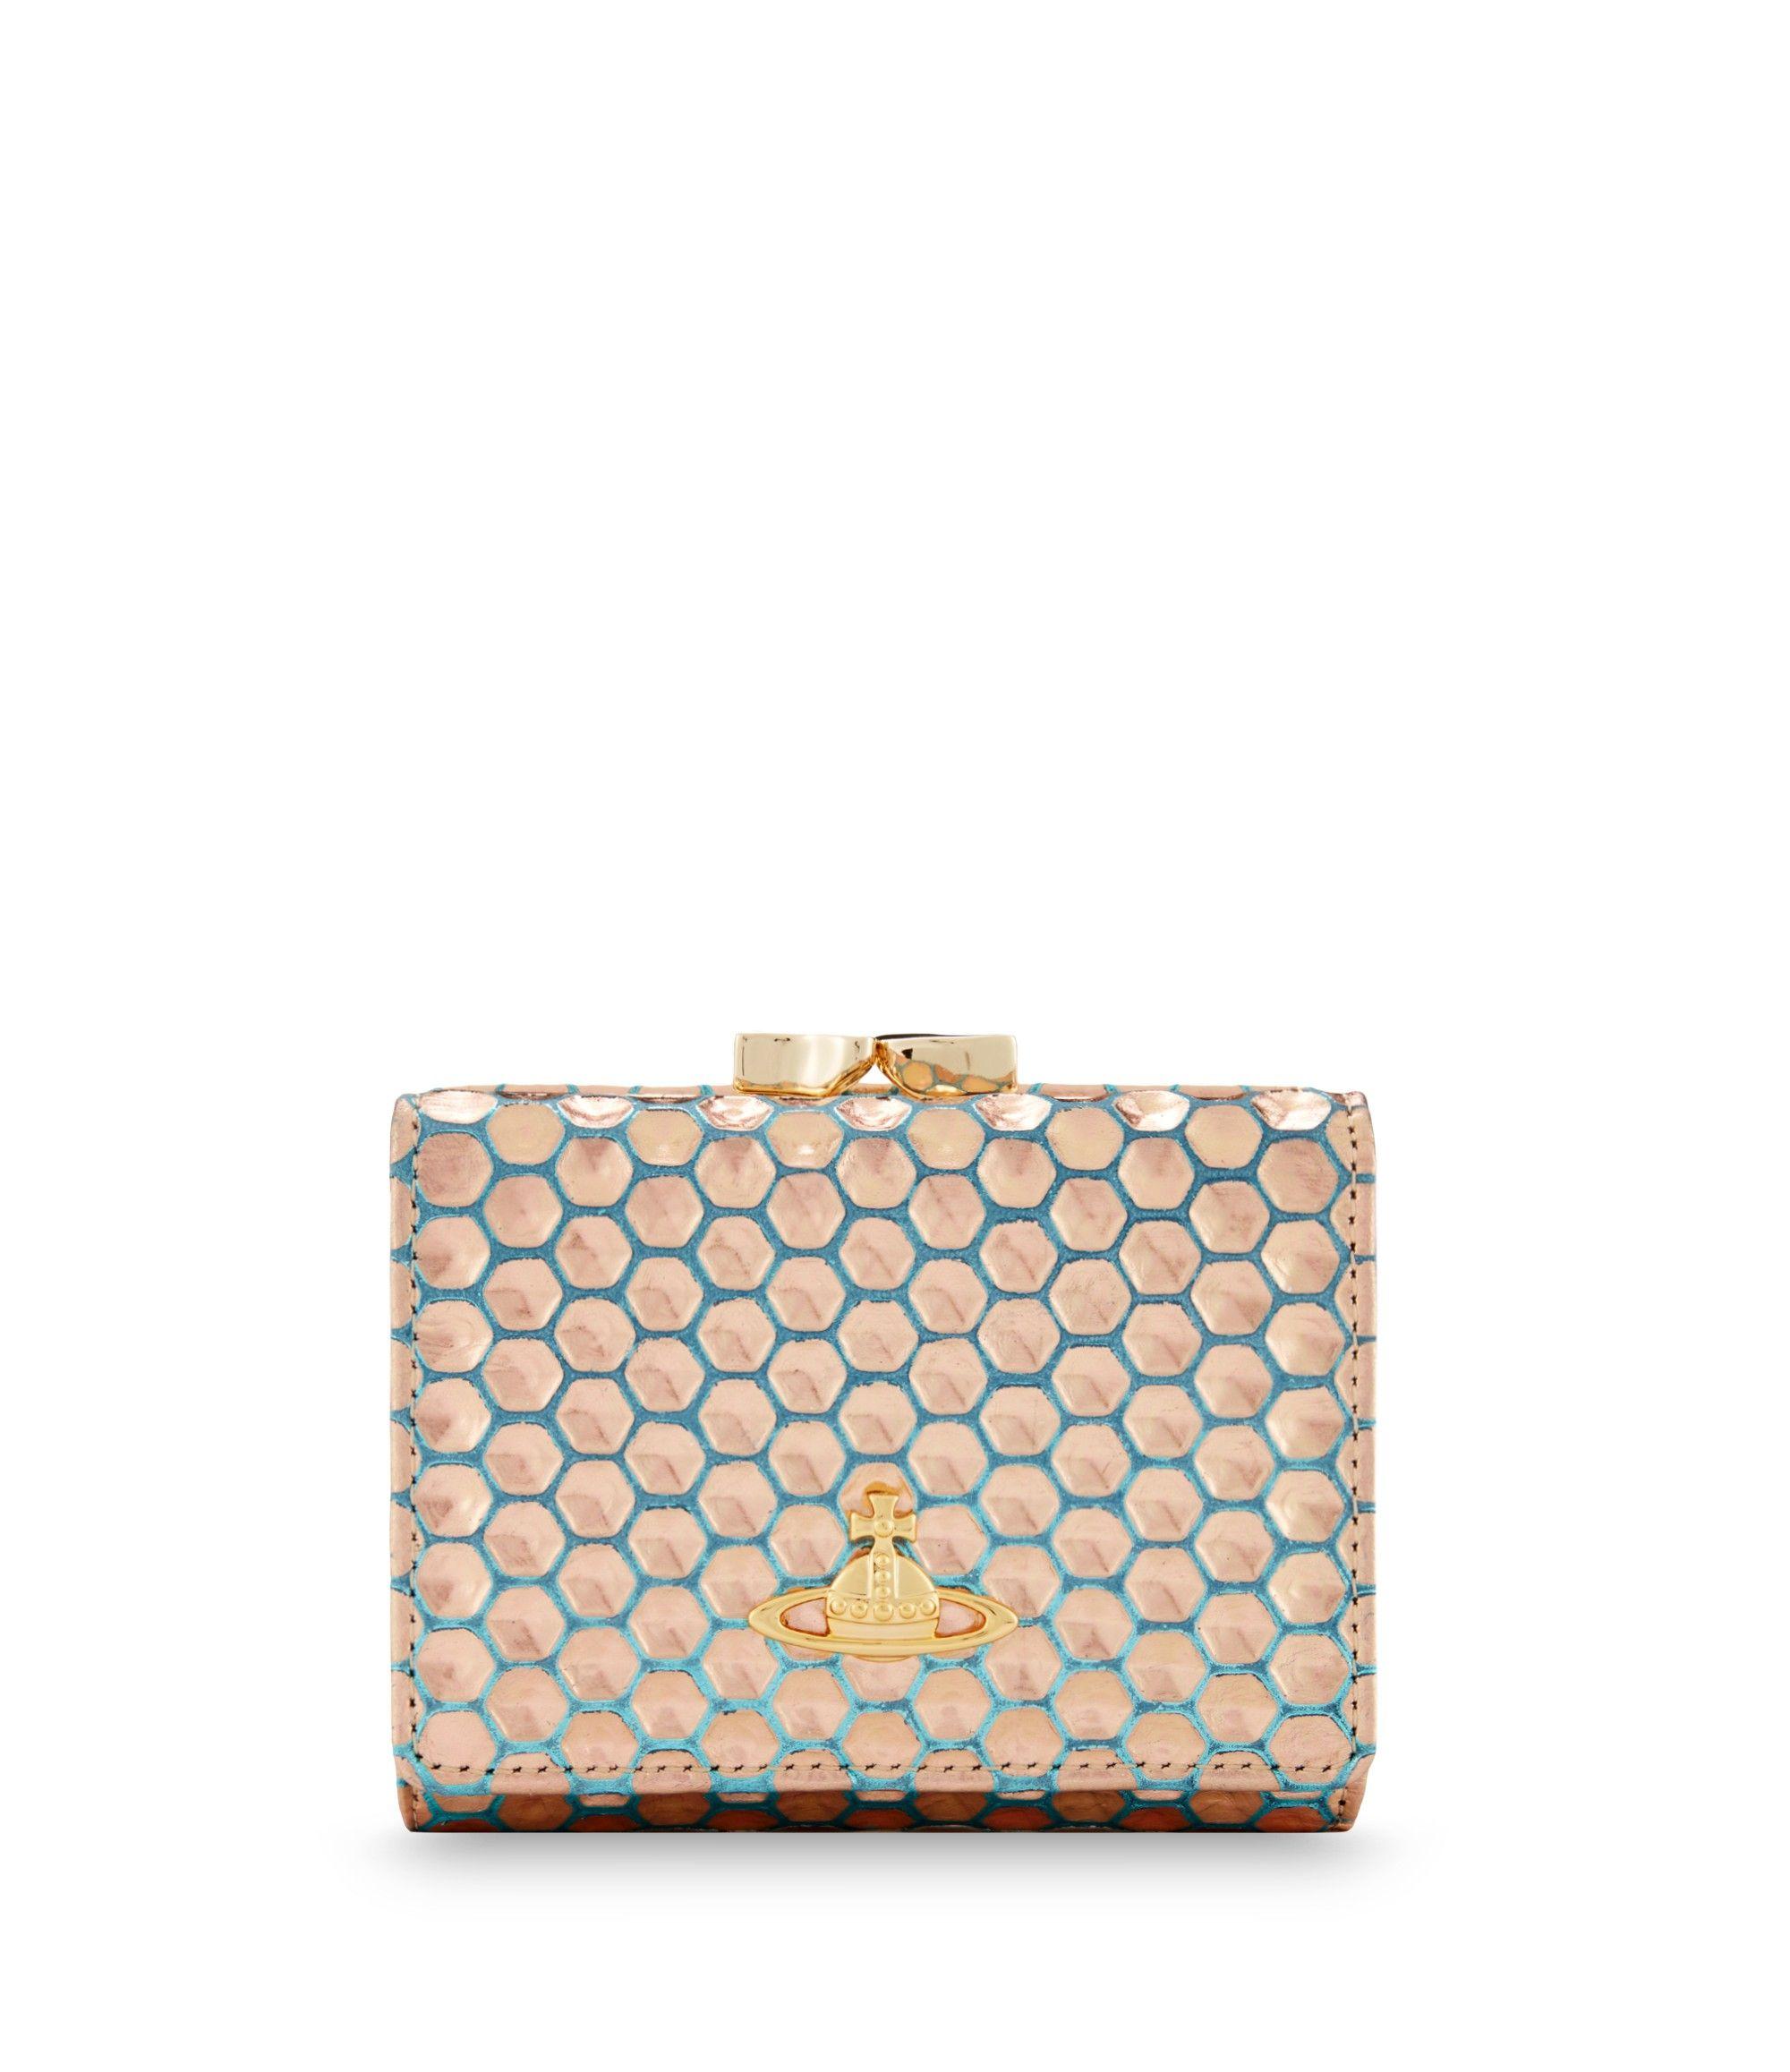 40c69c03ece Vivienne Westwood | Honey Comb Purse | unusual wallets and key ...